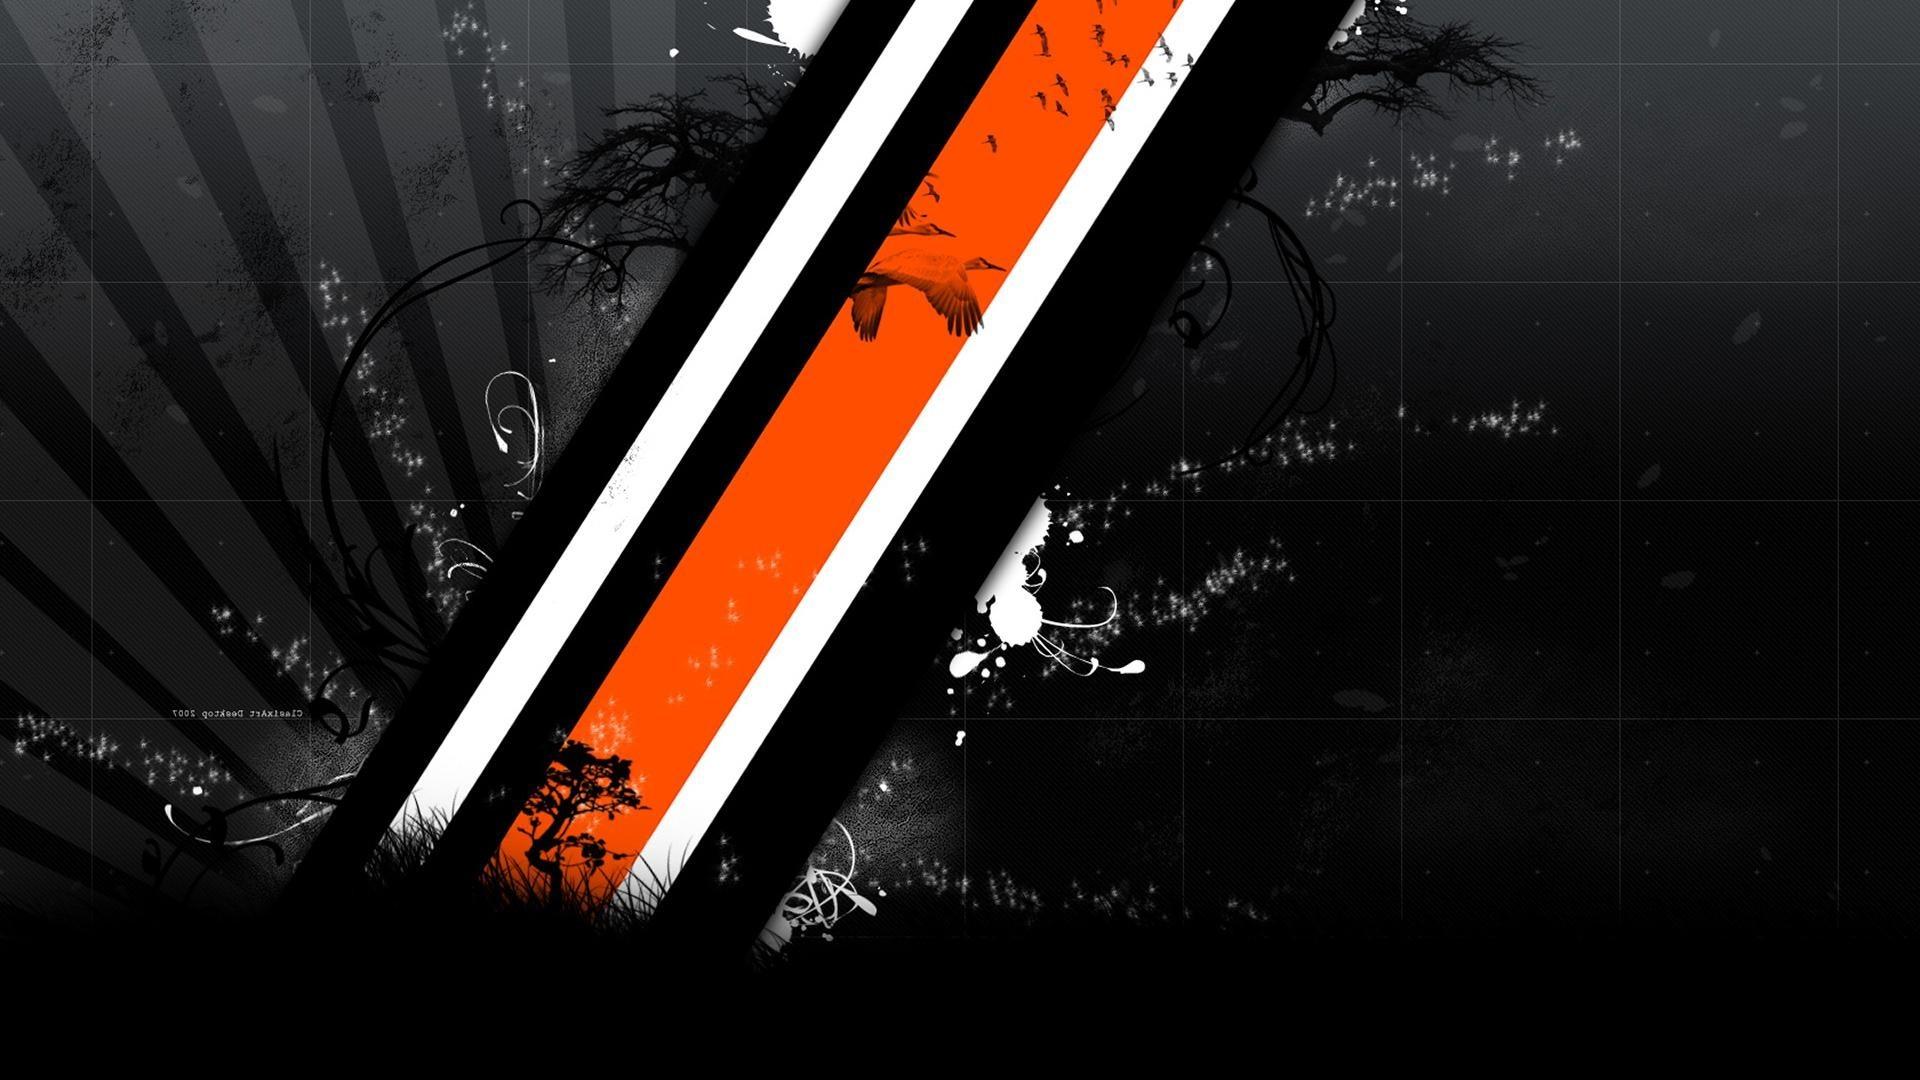 Orange And Black Wallpaper 75 Images